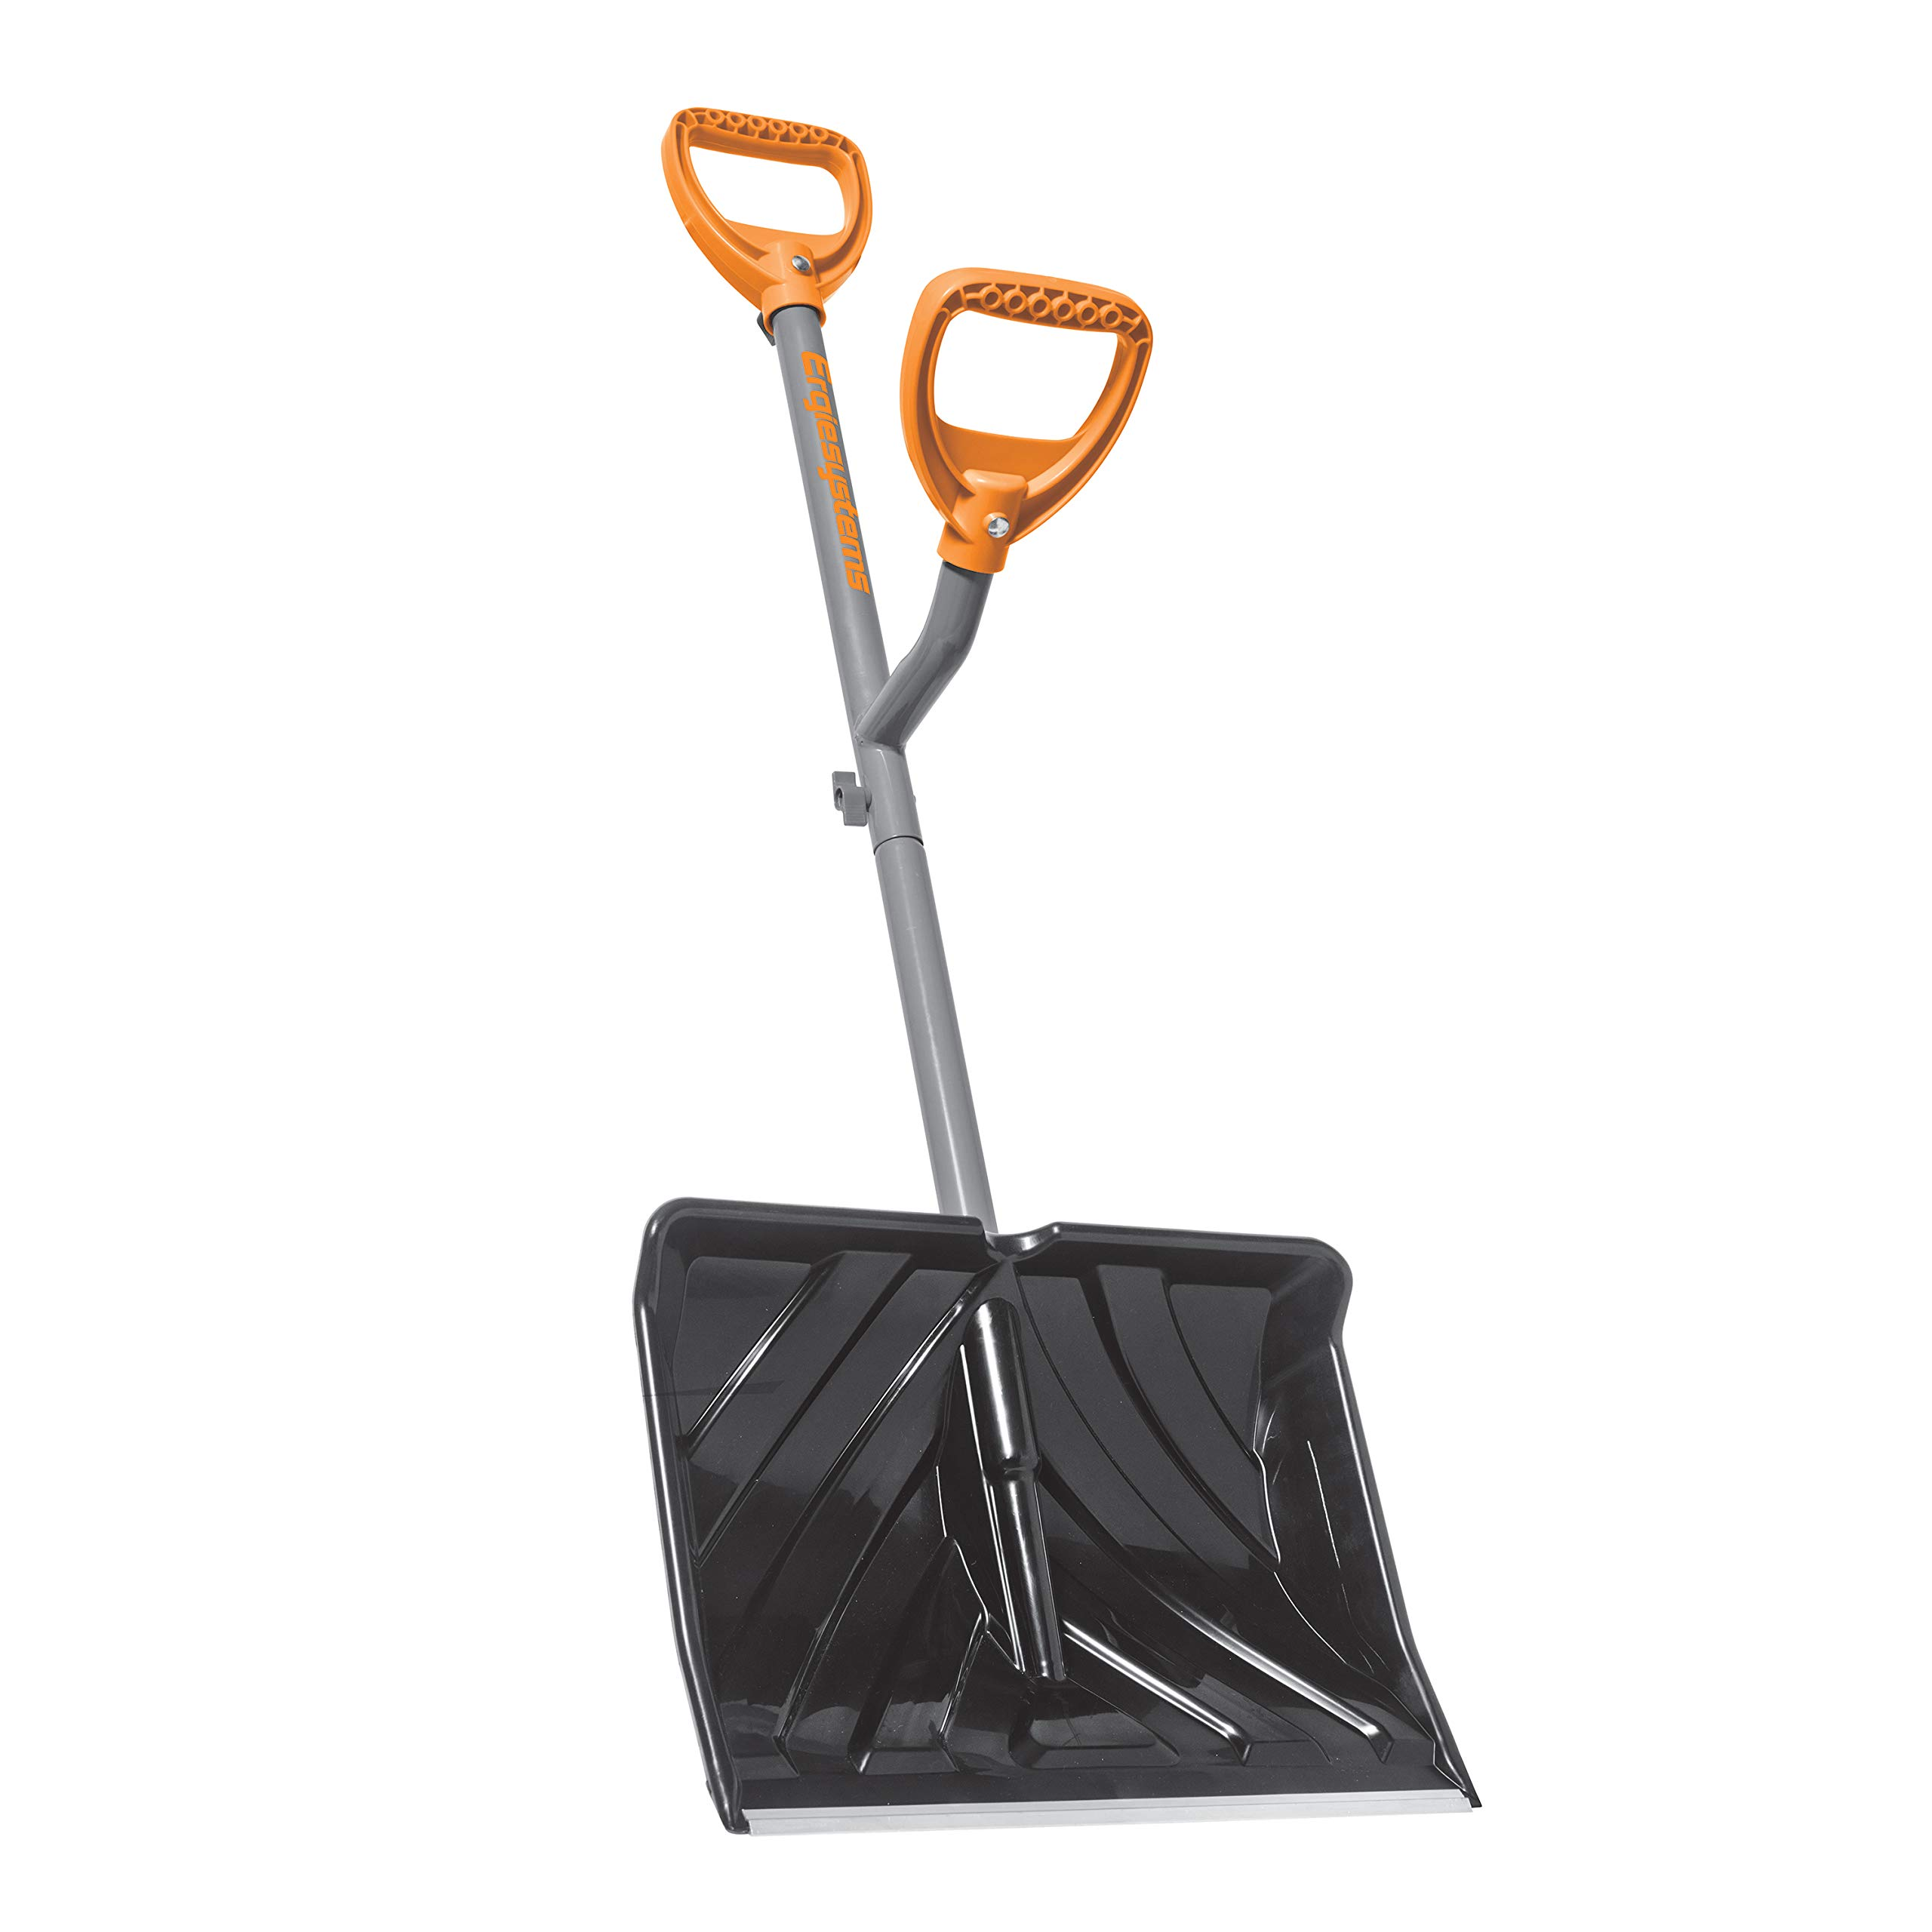 ERGIESHOVEL ERG-SNSH18 18-Inch Impact Resistant Blade Push/Scoop Combination Snow Shovel, Orange by ERGIESHOVEL